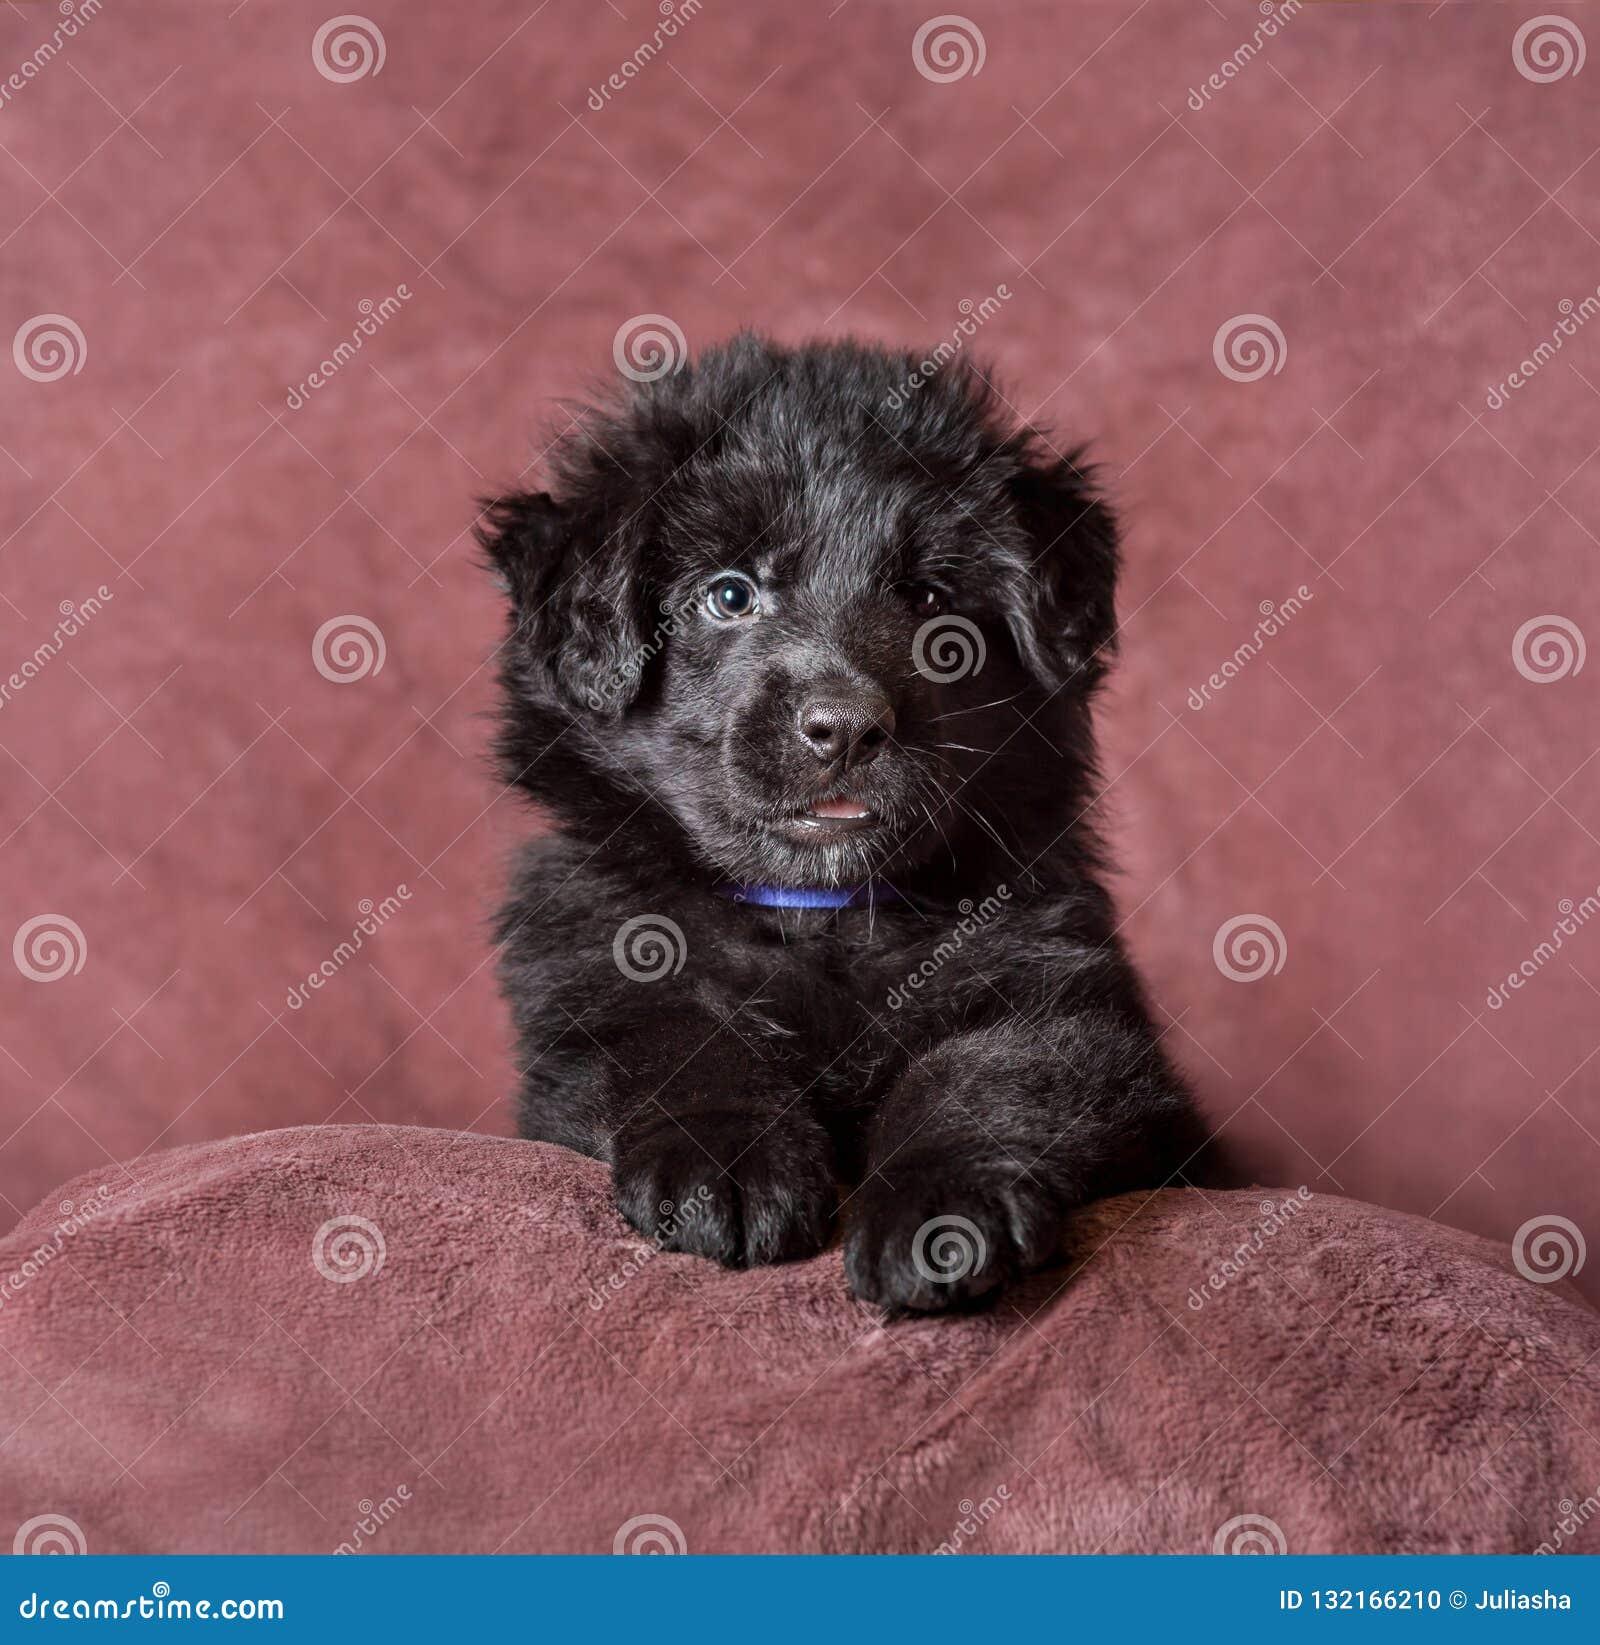 Long Haired Black German Shepherd Puppy Studio Stock Photo Image Of Closeup Adorable 132166210